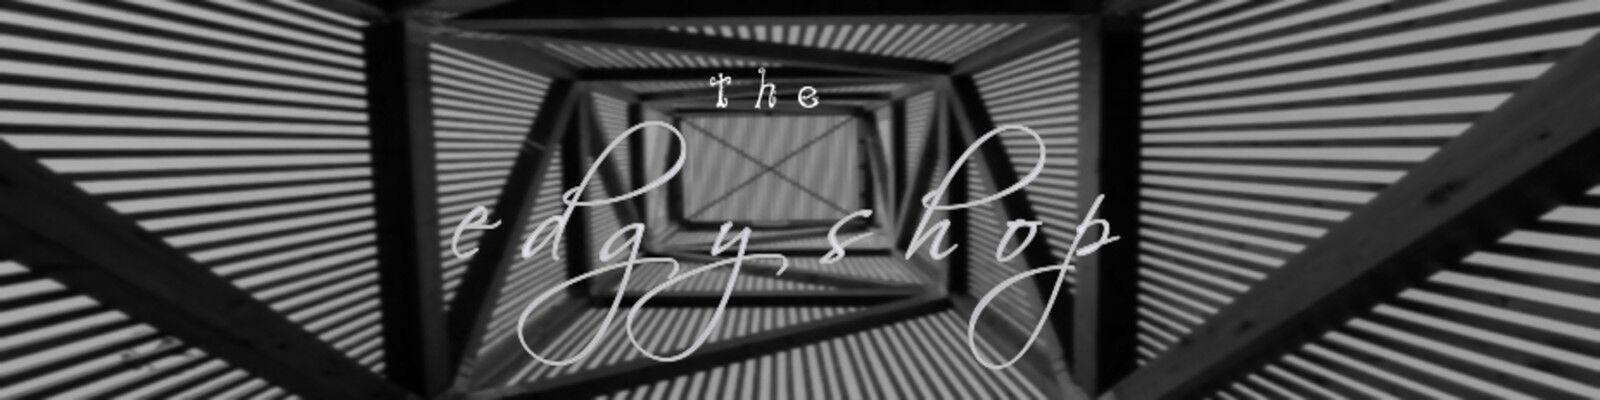 TheEdgyShop